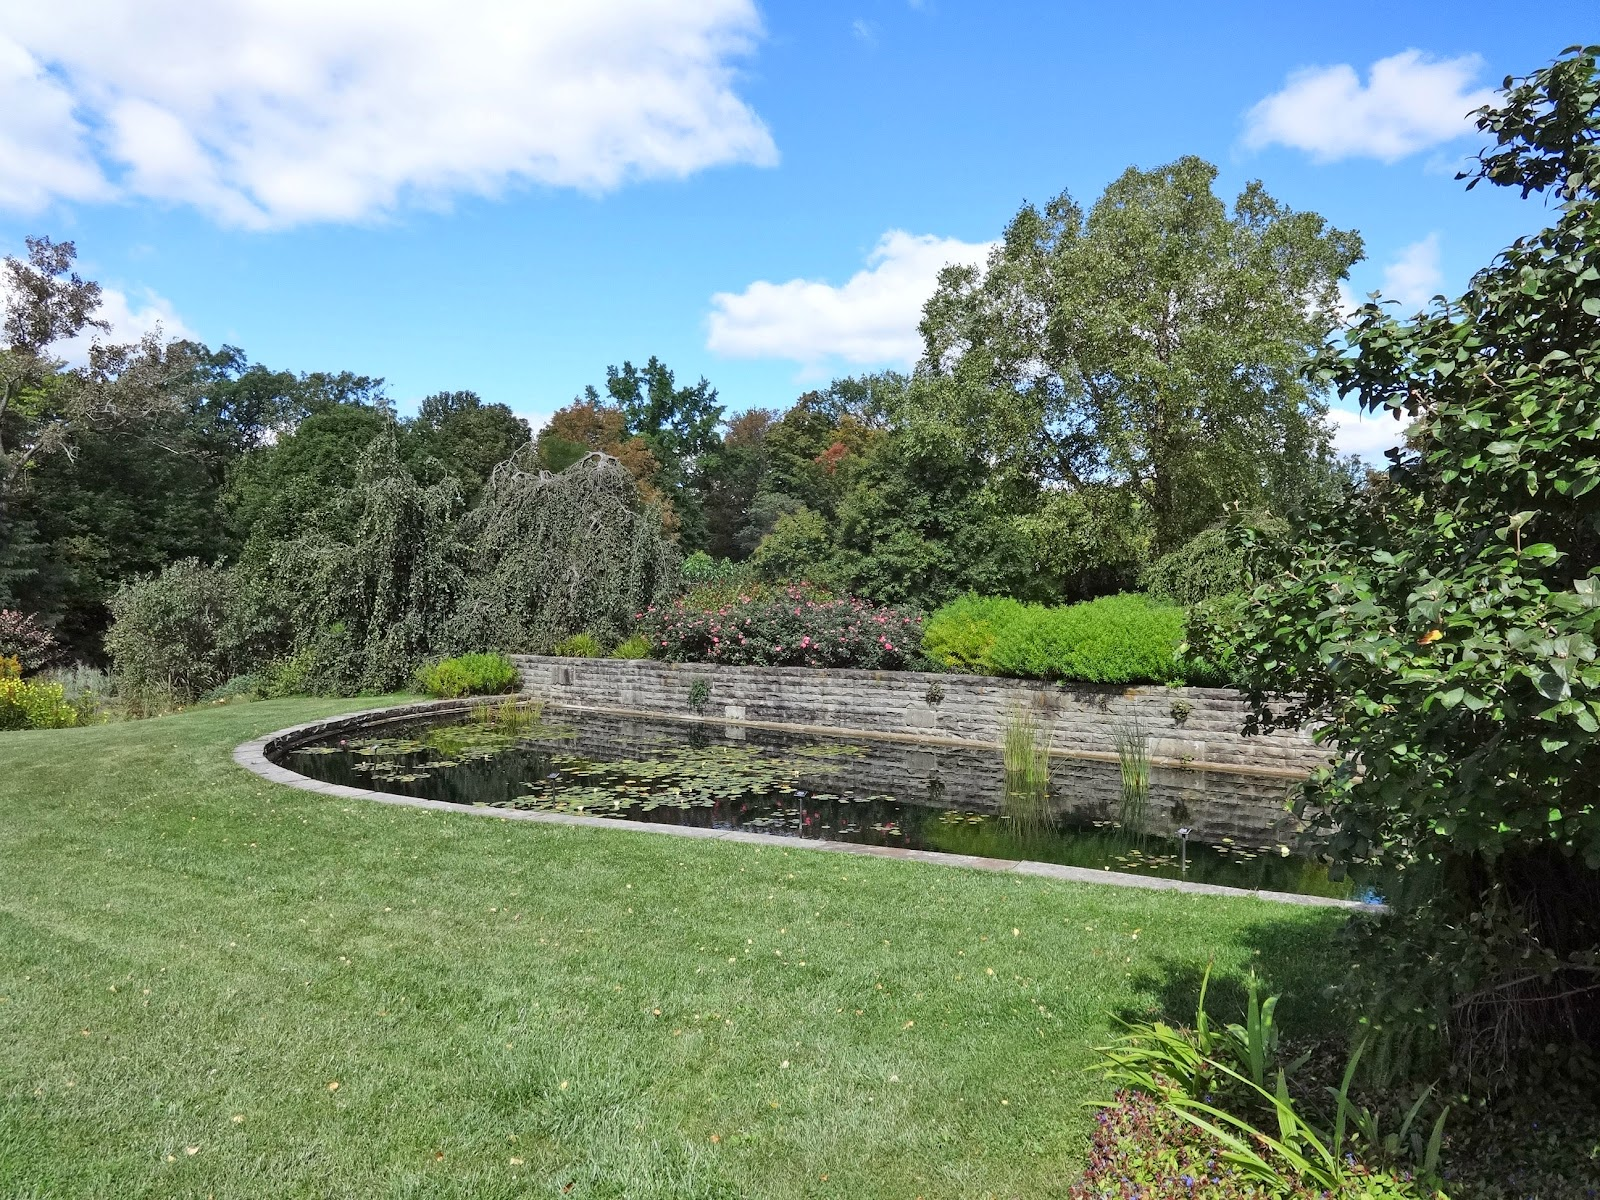 Jax Stumpes Holden Arboretum Willoughby Oh 9 14 2013